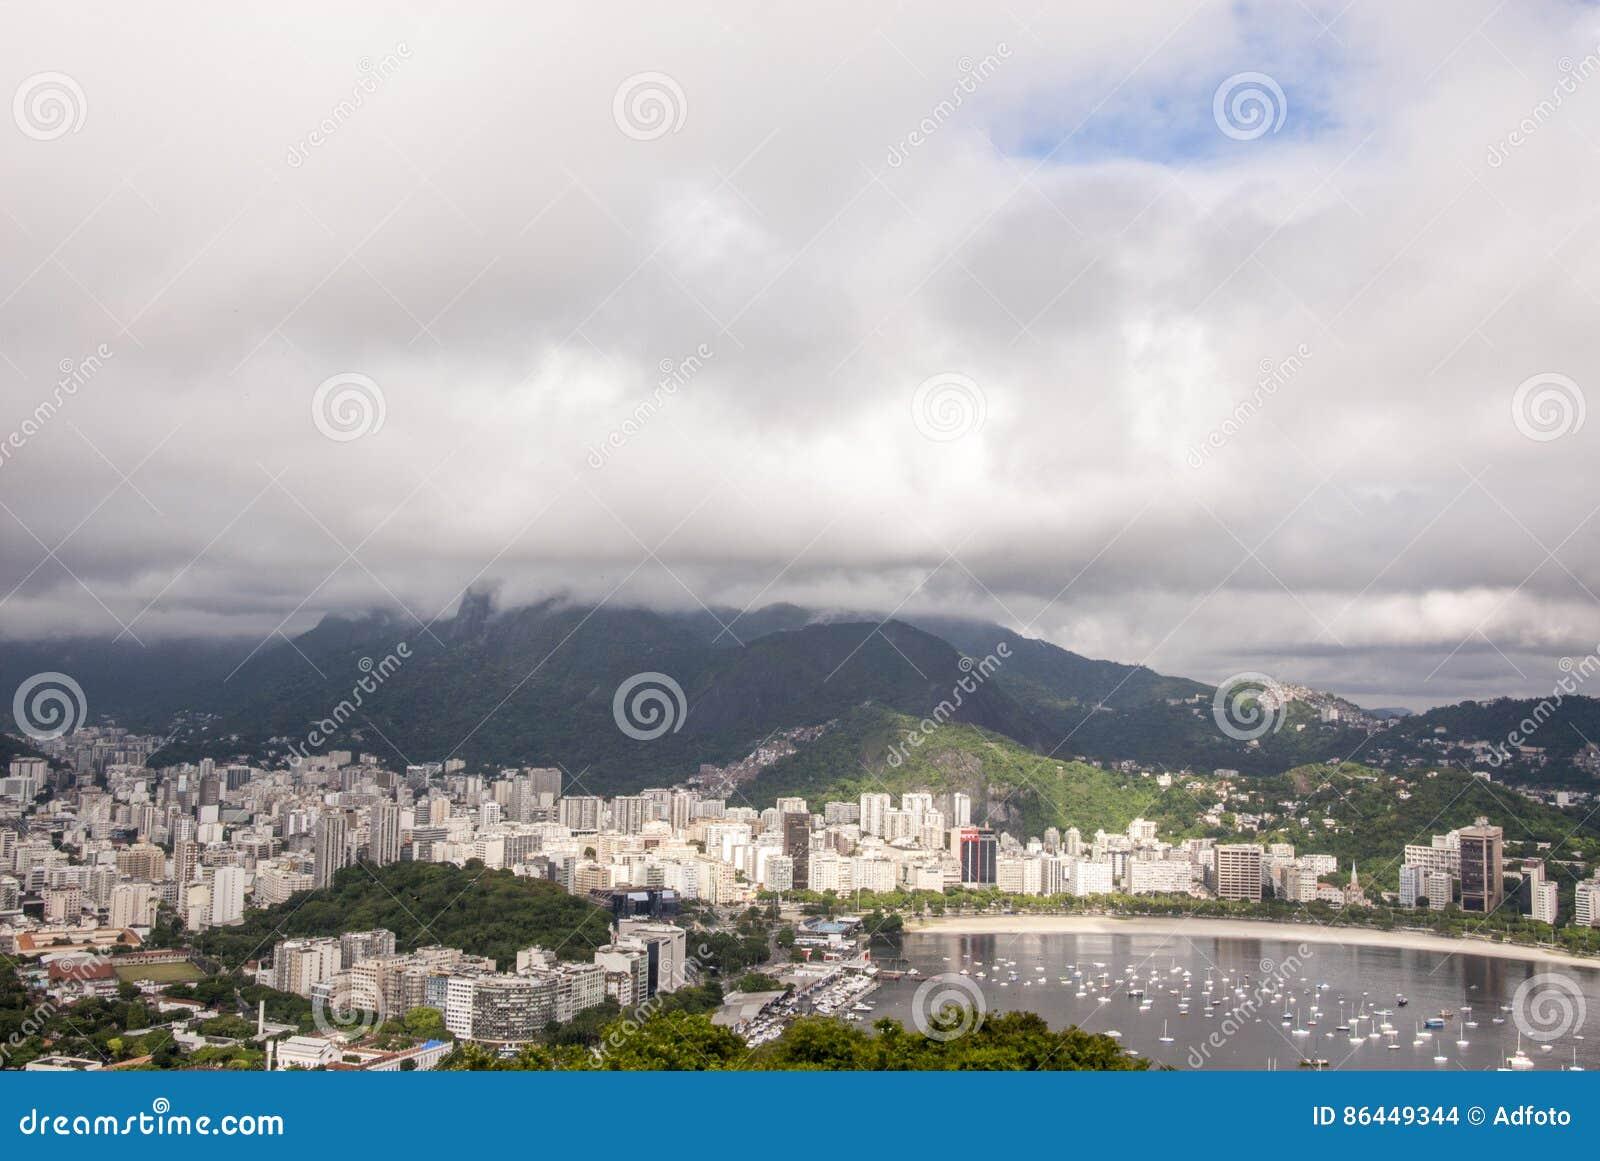 Widok zatoczka Botafogo w Rio De Janeiro